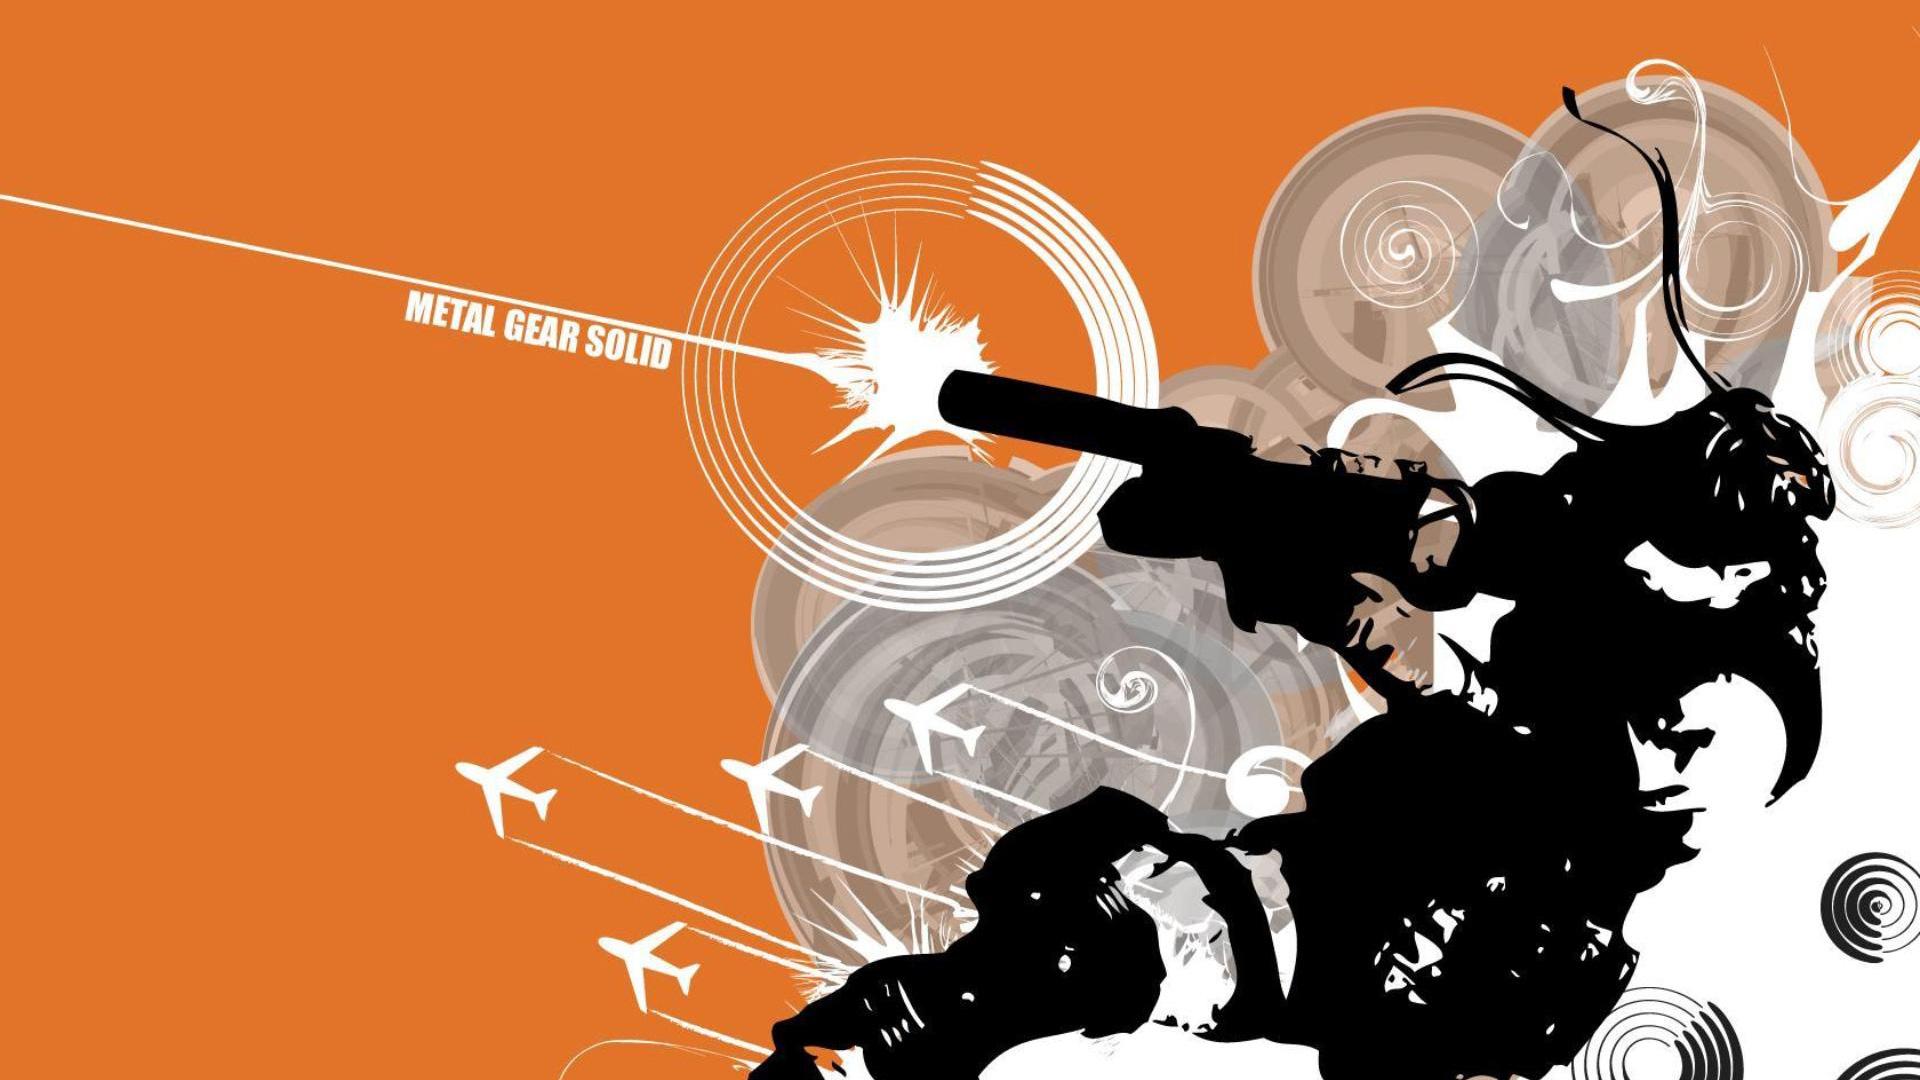 Free Metal Gear Solid Wallpaper in 1920x1080